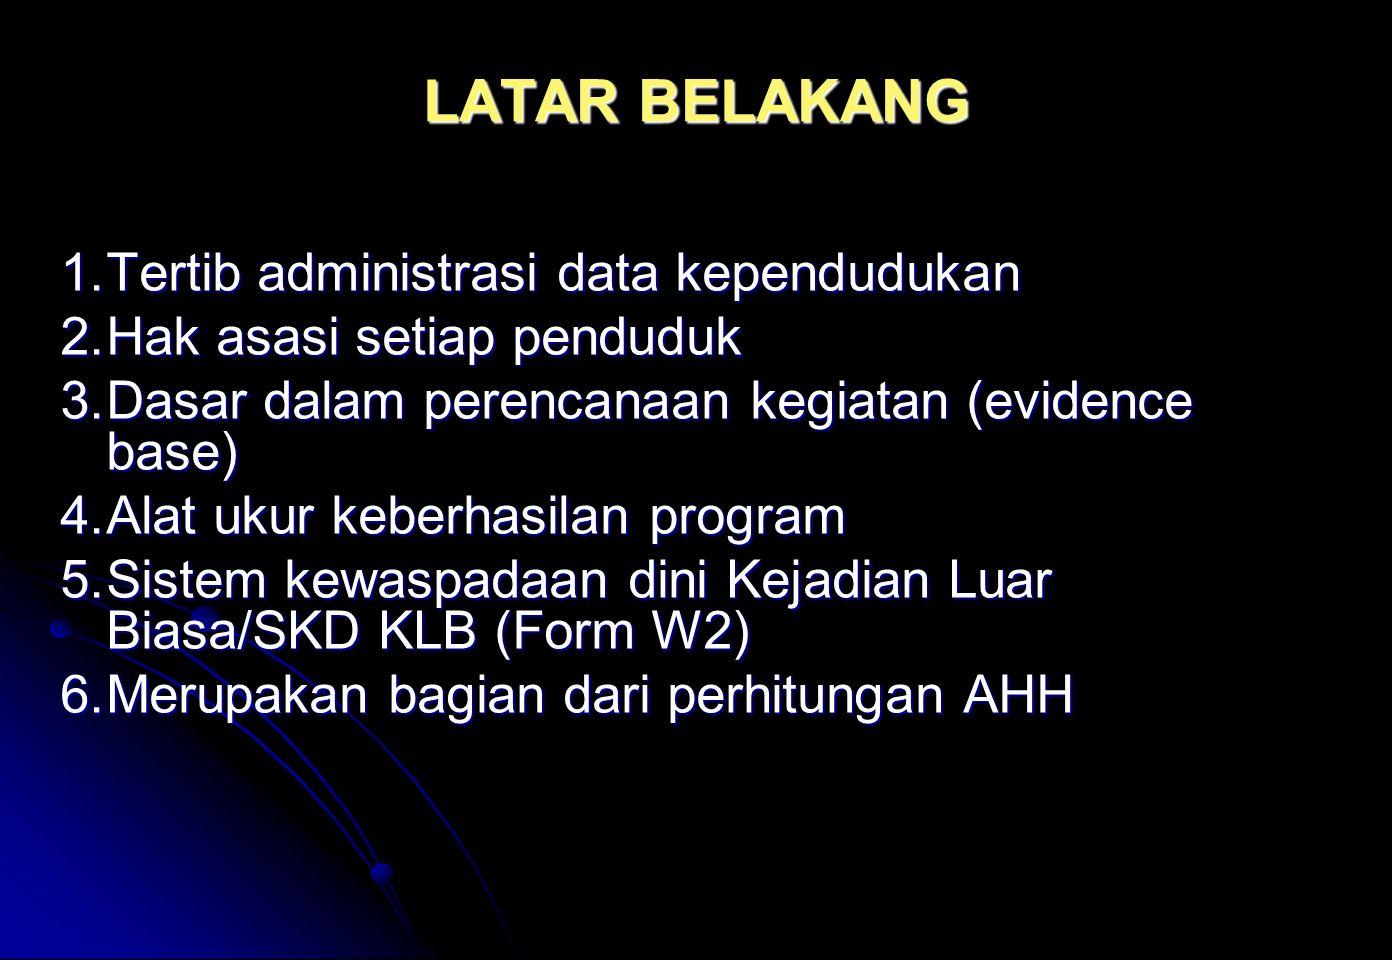 LATAR BELAKANG 1.Tertib administrasi data kependudukan 2.Hak asasi setiap penduduk 3.Dasar dalam perencanaan kegiatan (evidence base) 4.Alat ukur kebe